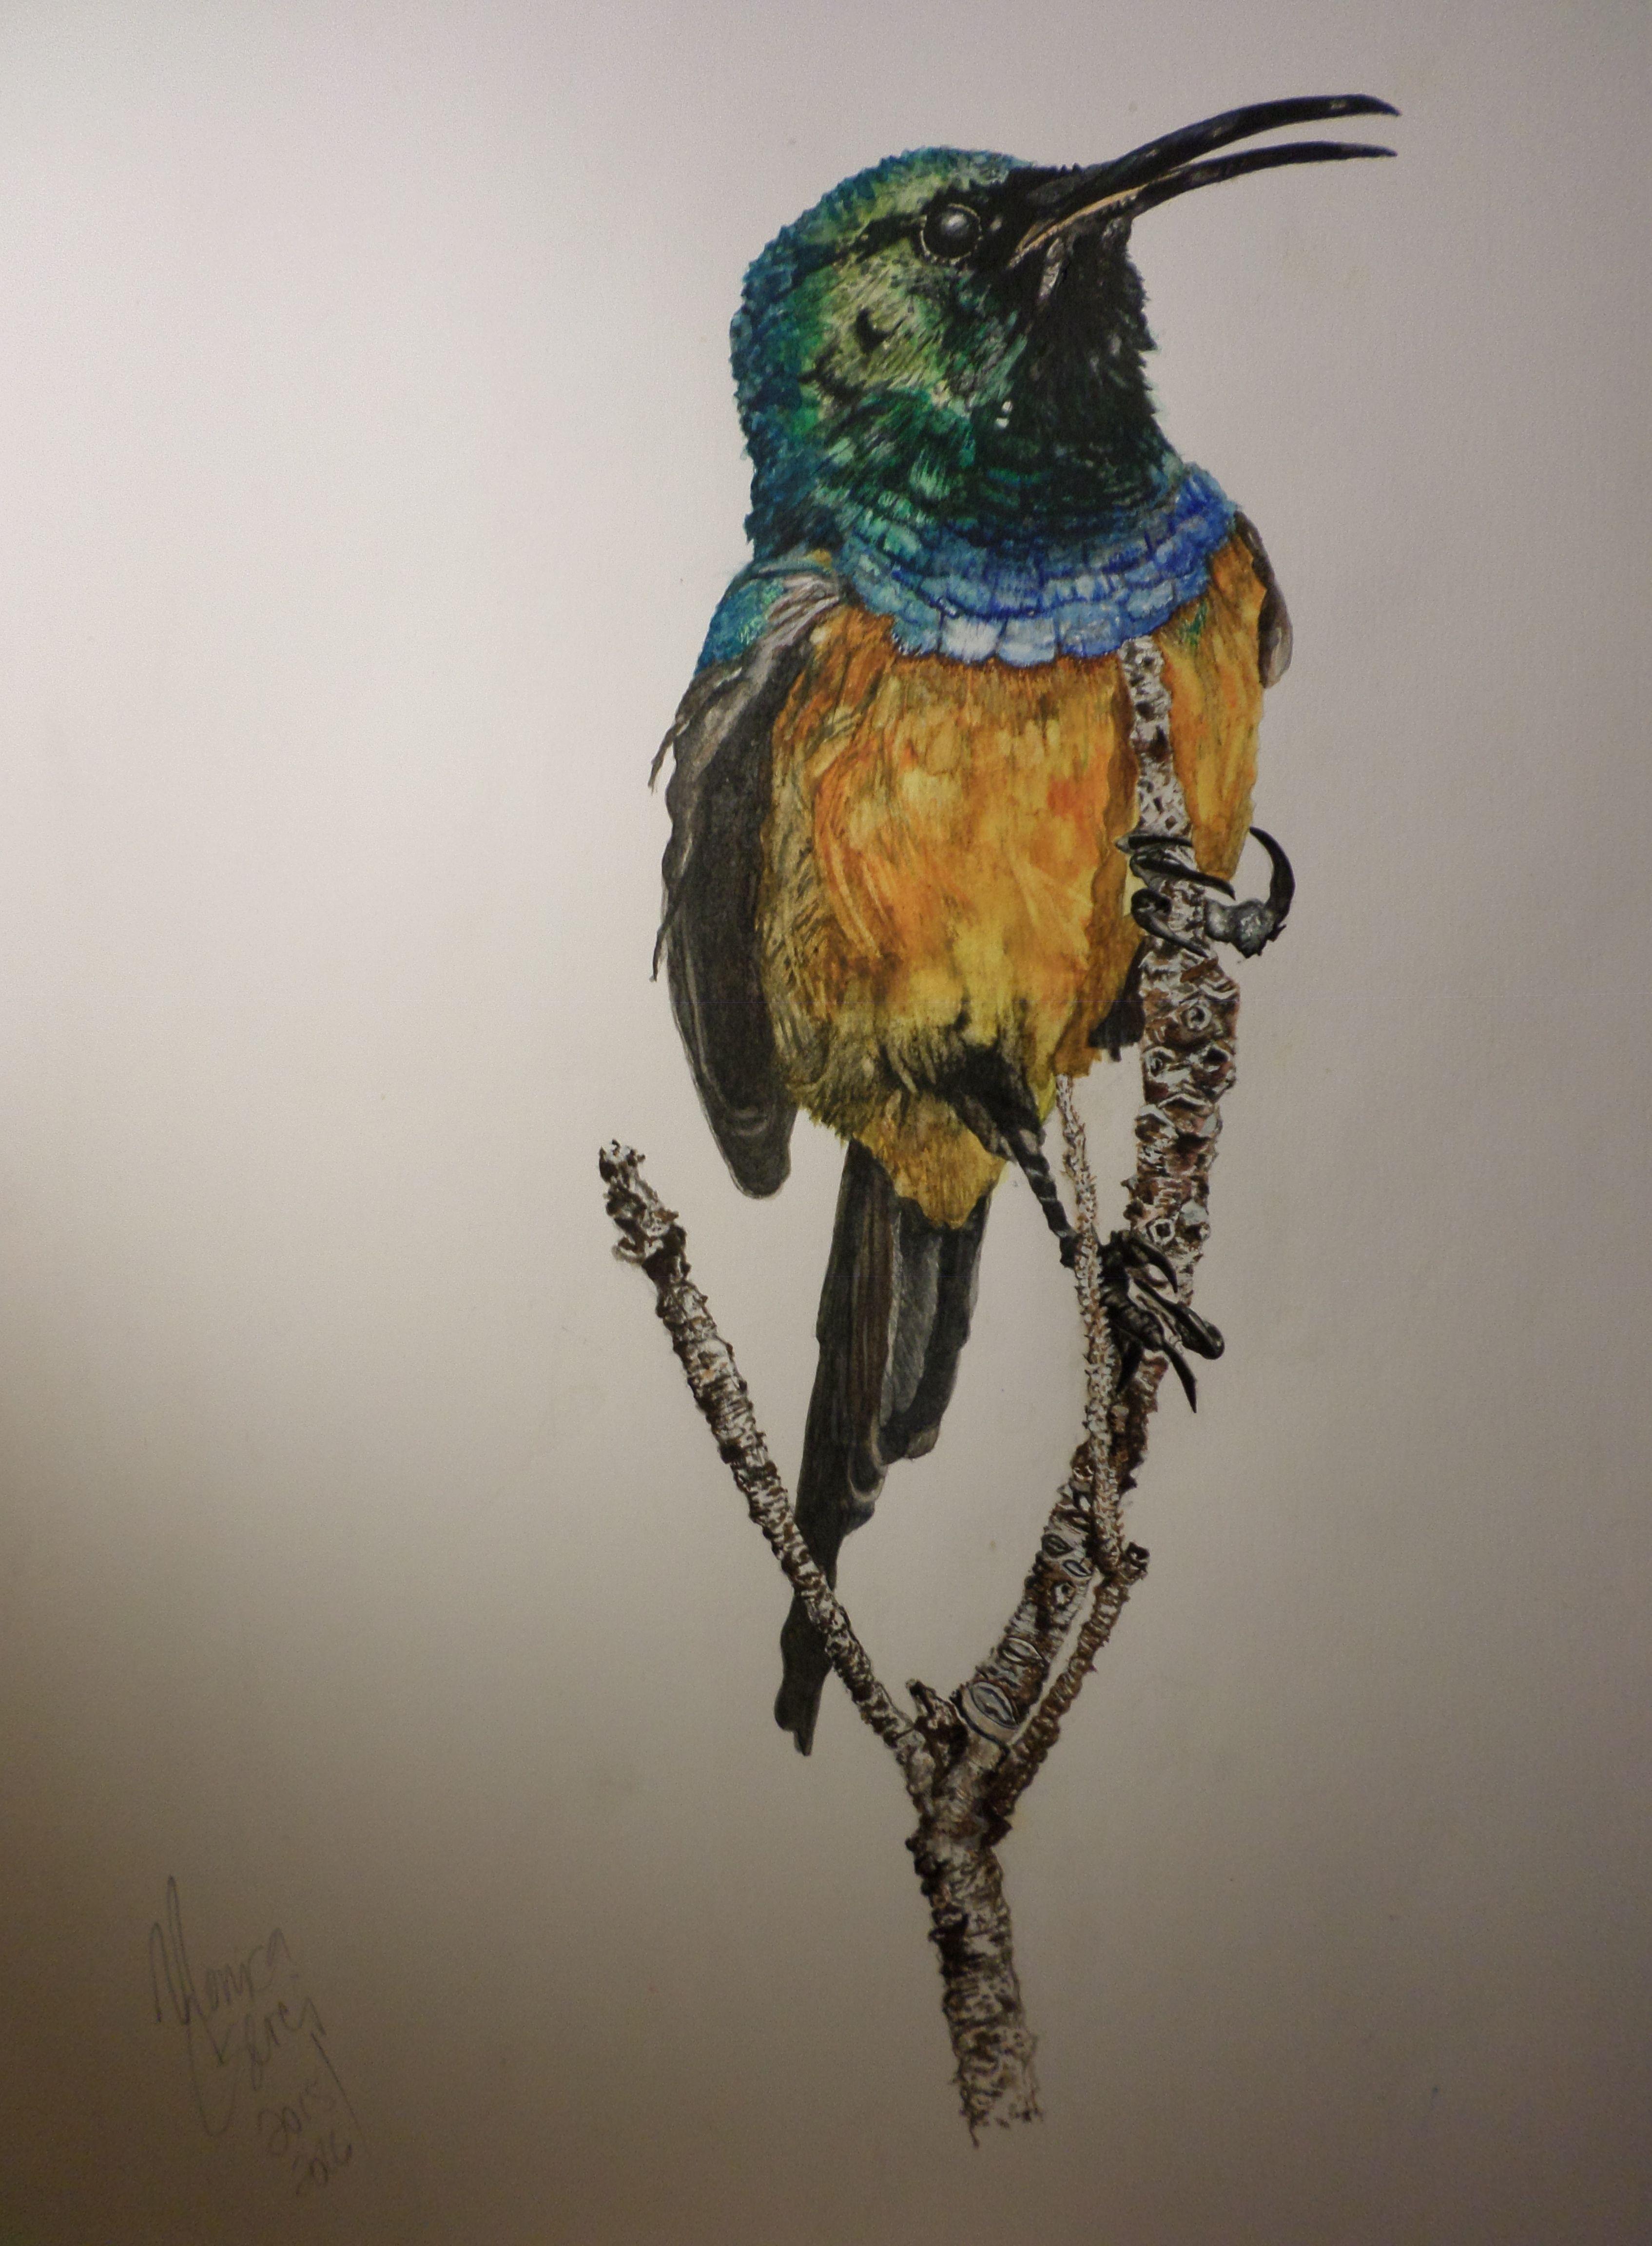 Original Artwork Watercolour Painting By Monica K Cserei Title